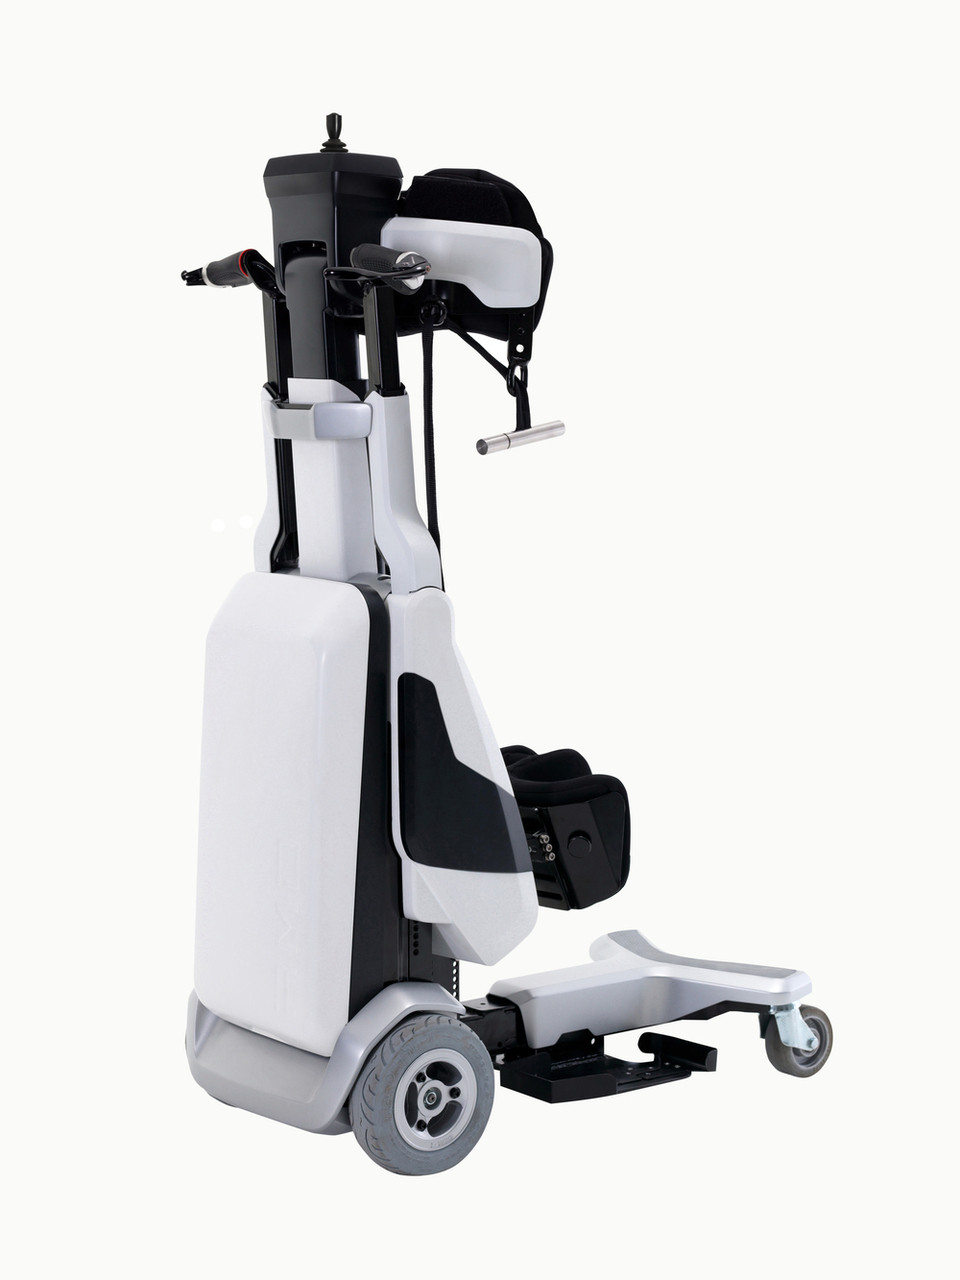 The Tek-RMD, by Matia Robotics